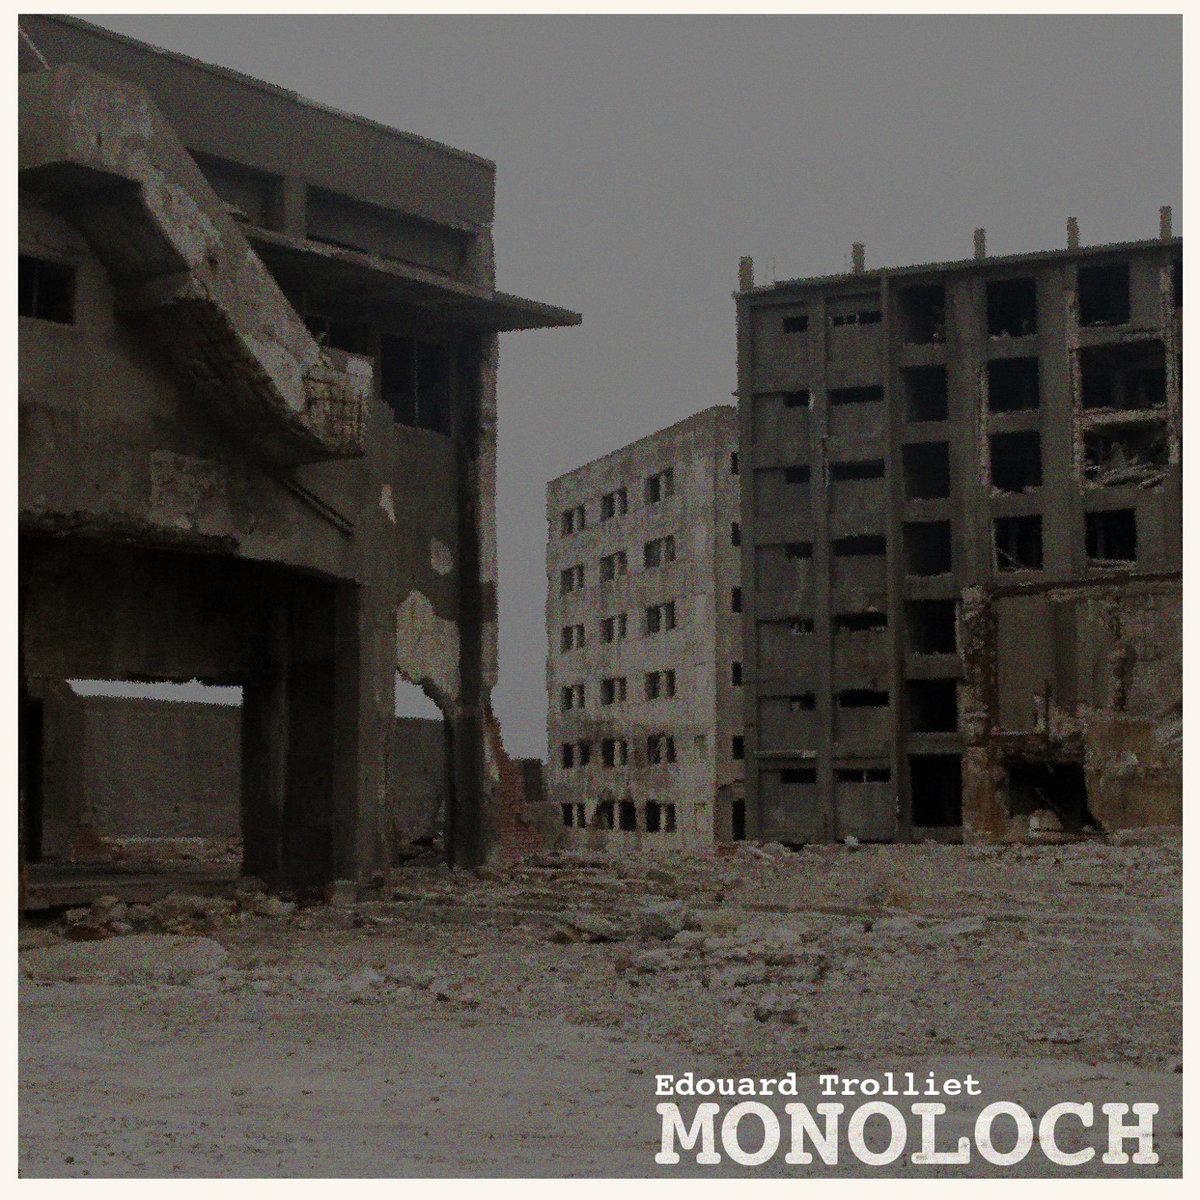 https://dhaturarecords.bandcamp.com/album/monoloch-the-sequels